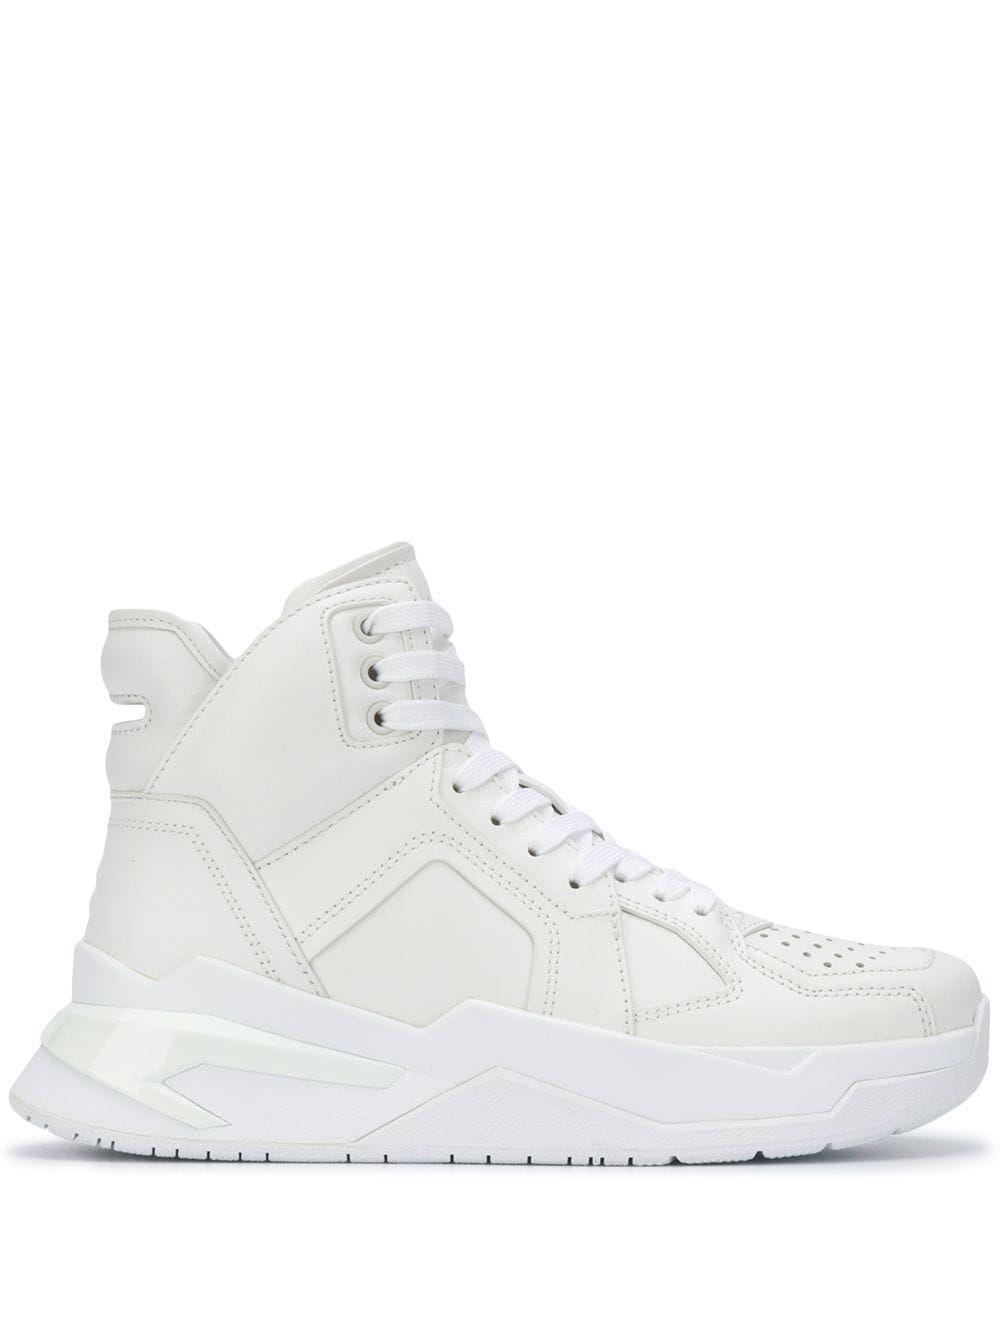 Balmain B-Ball High Top Sneakers